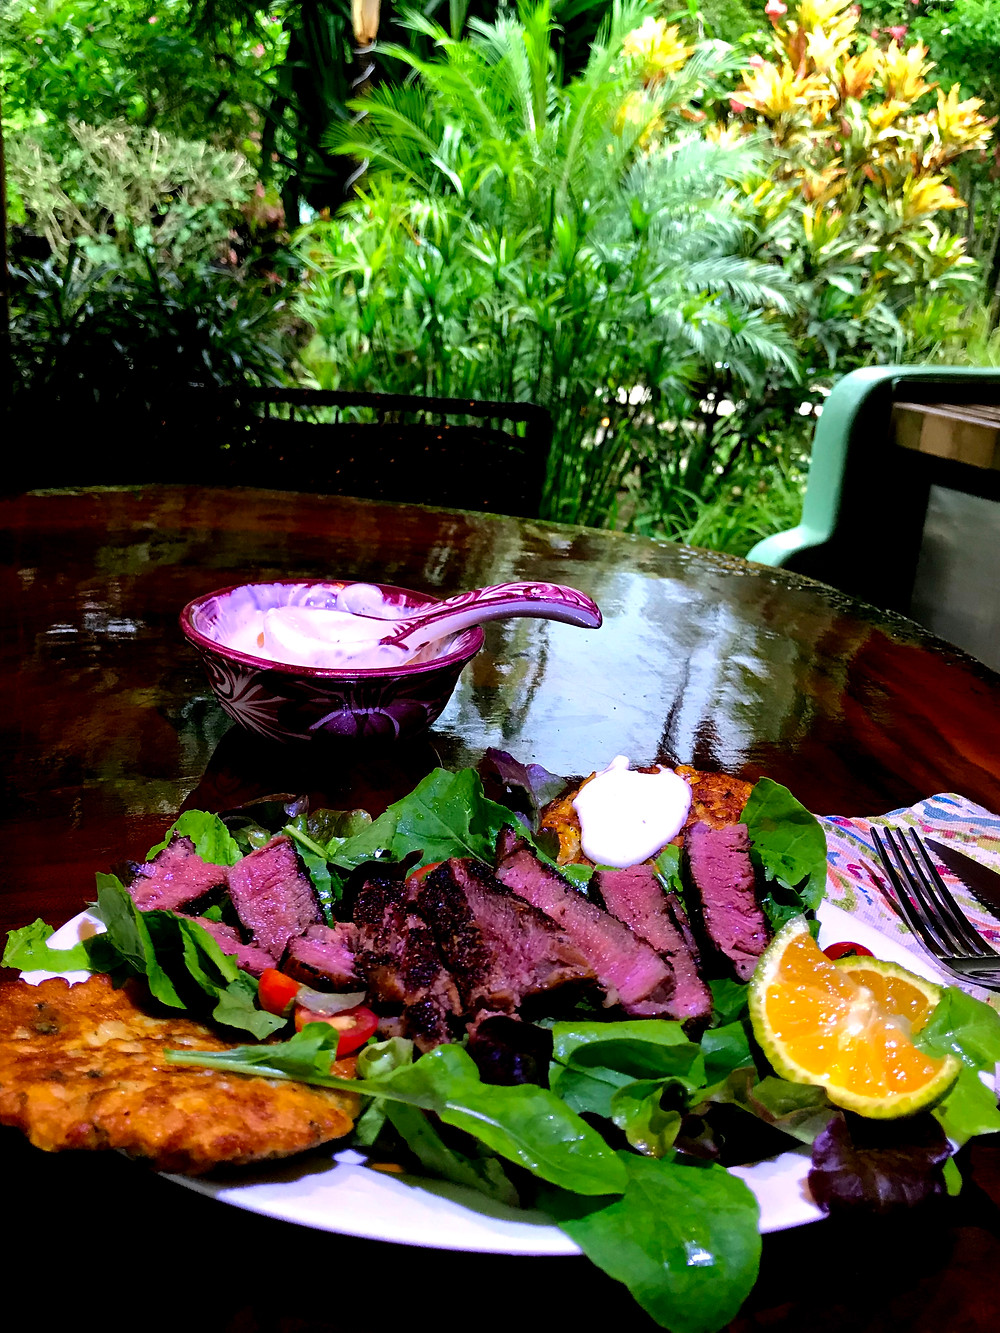 Steak salad with Jalapeño Corn Cakes